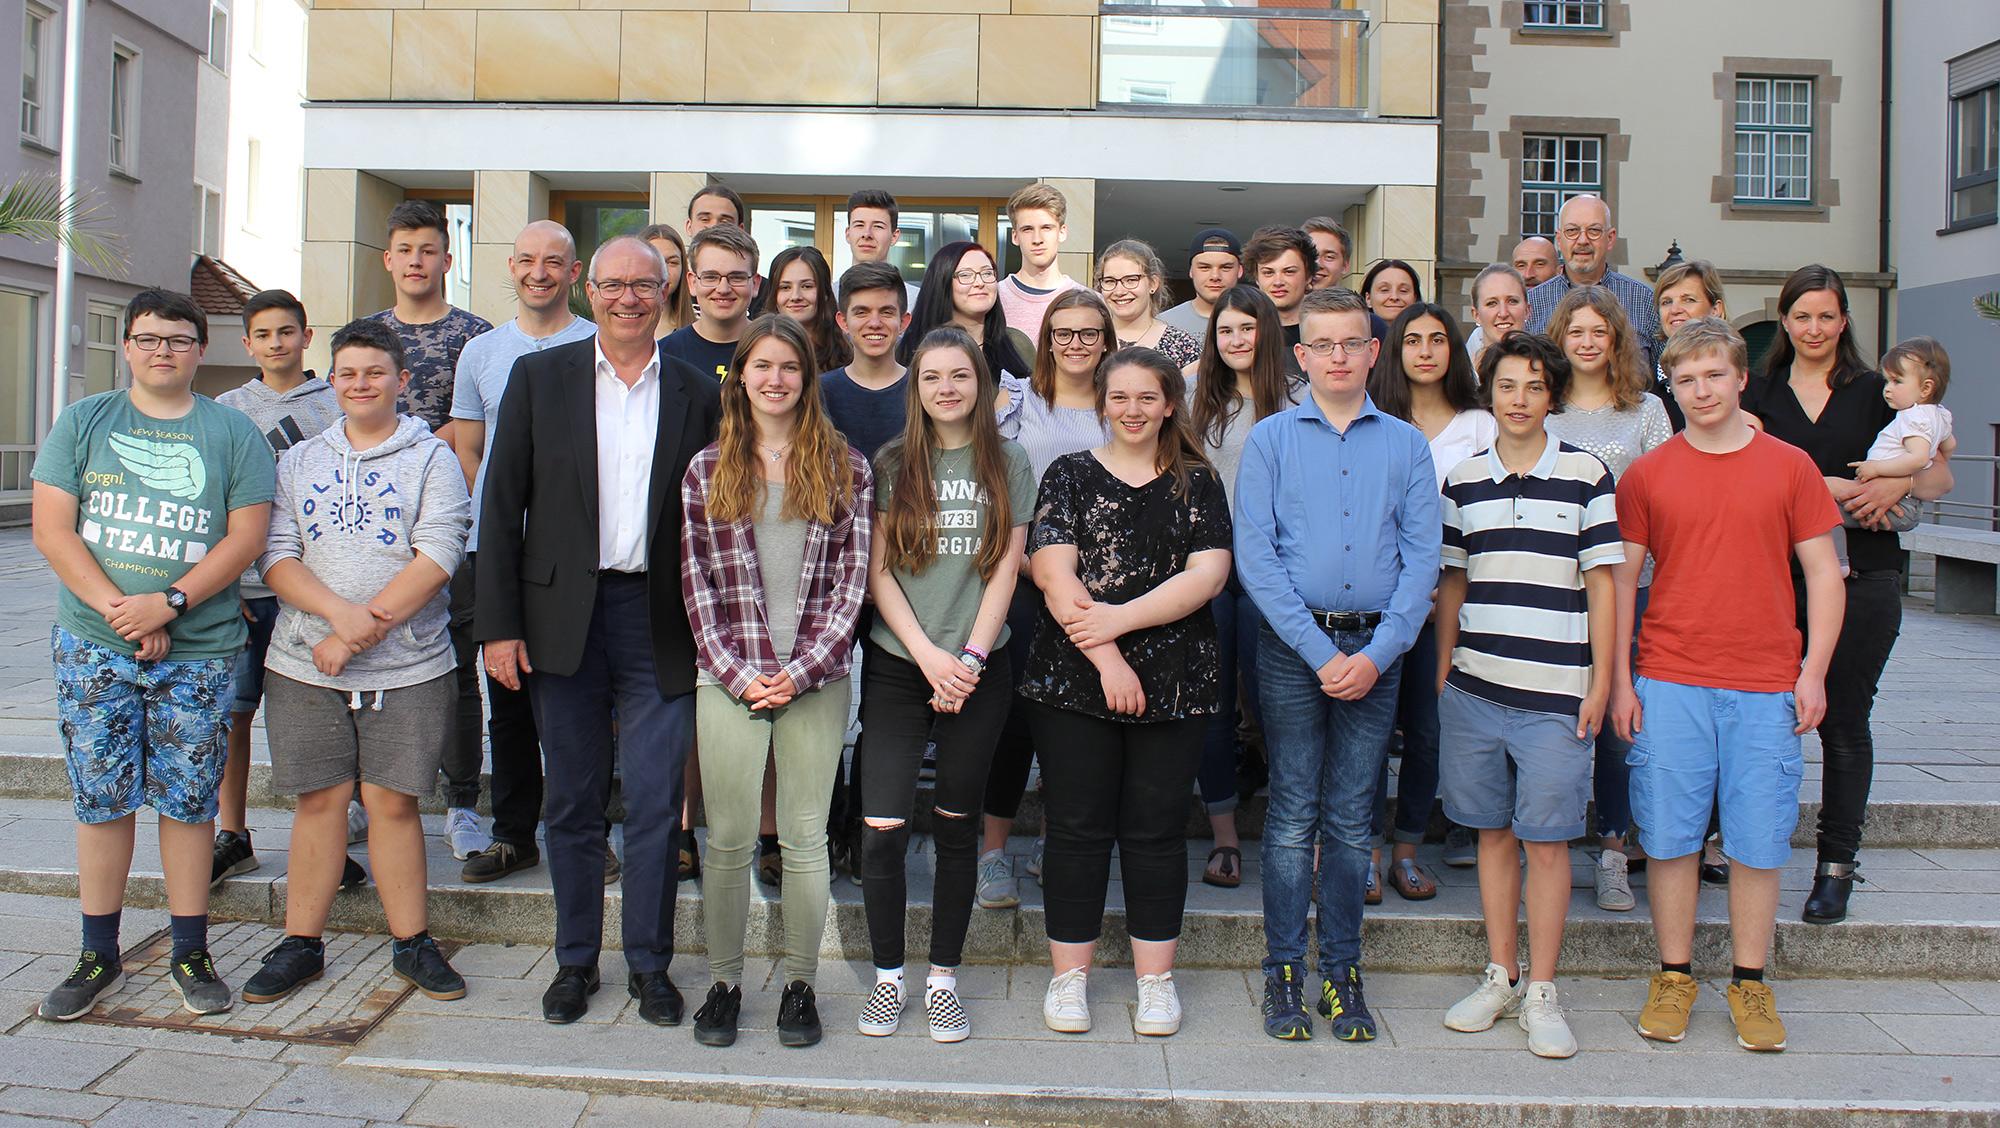 Jugendforum Sigmaringen Gruppenbild